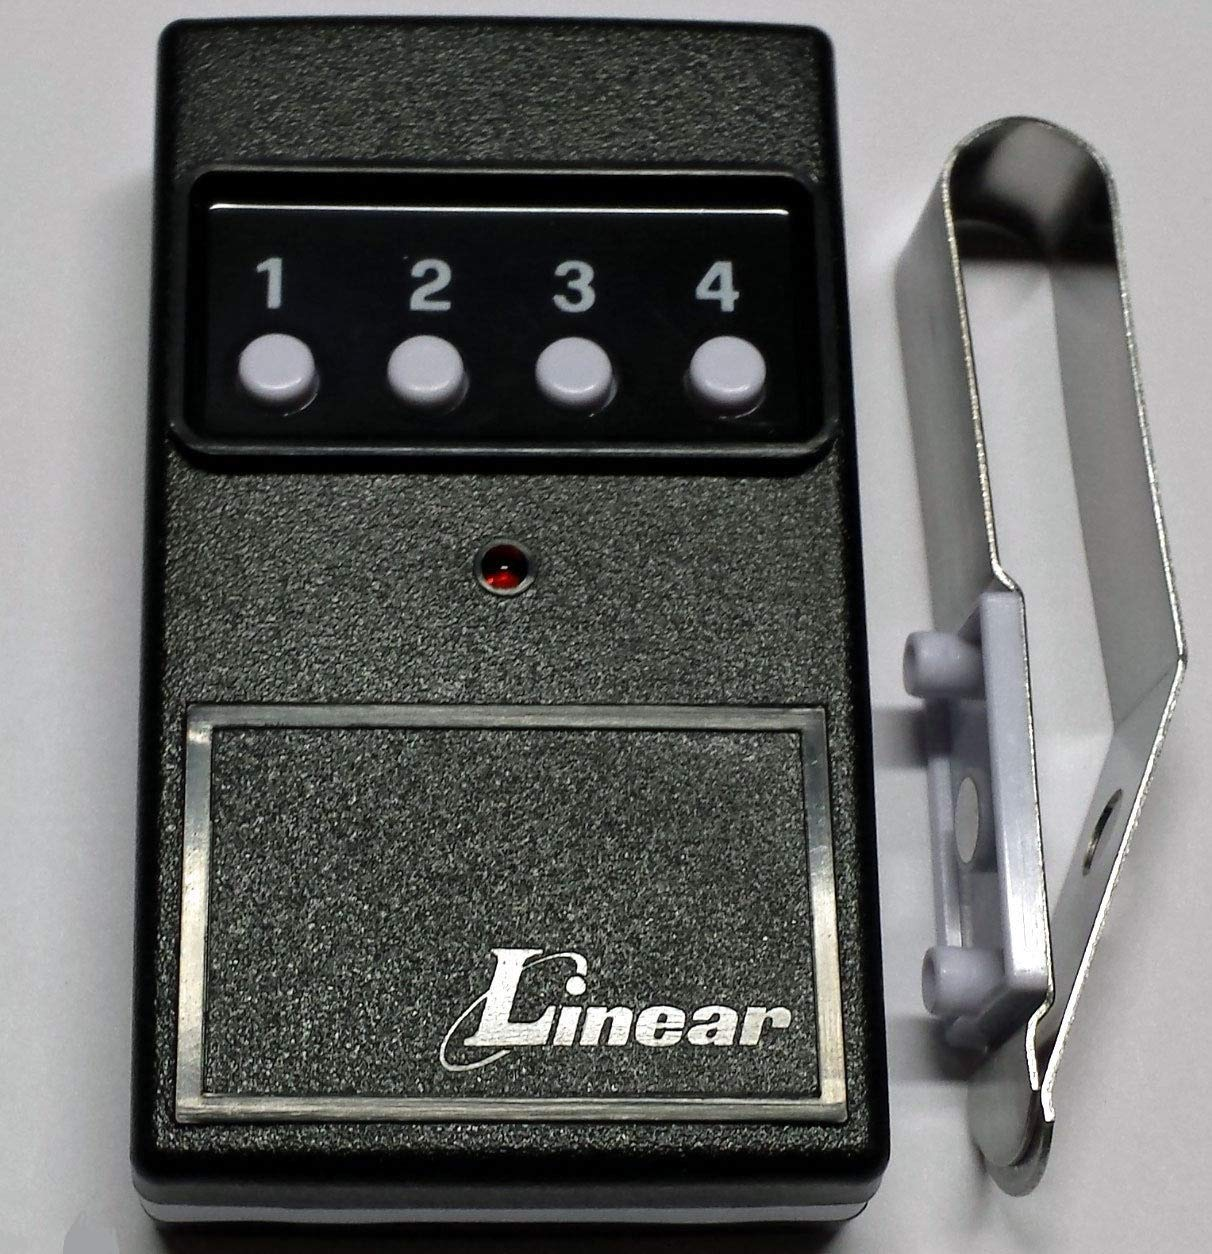 Linear Delta-3 DT4A 4 Four Button Visor Gate Garage Door Opener Remote DNT00027B